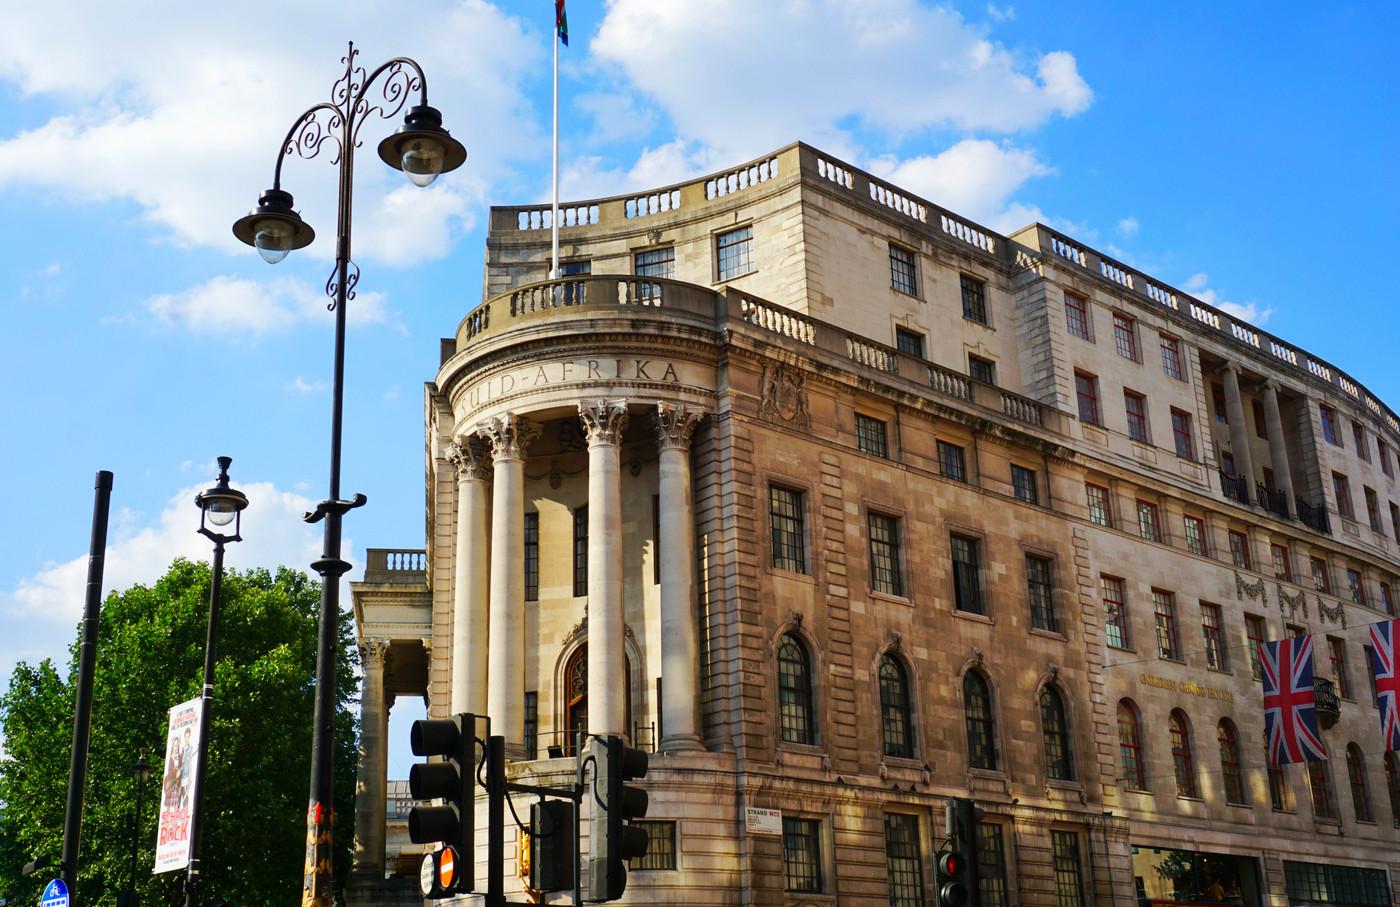 Australian High Commission, London, Englamd